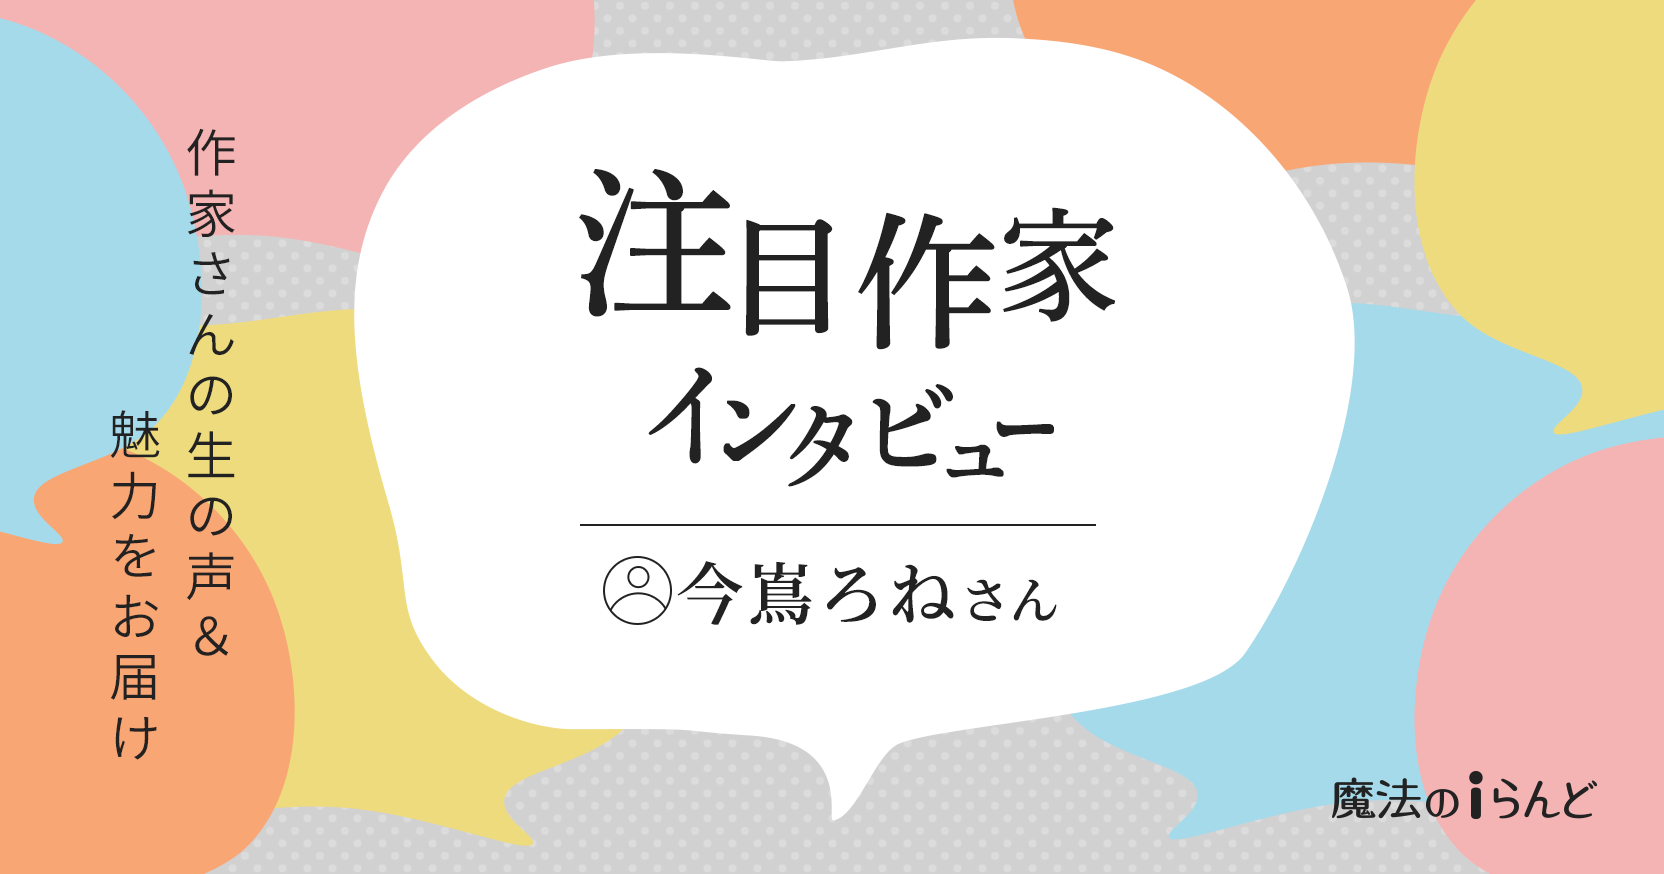 https://storage.googleapis.com/blog-info/entry/2021/01/interview_ogp_rone.png